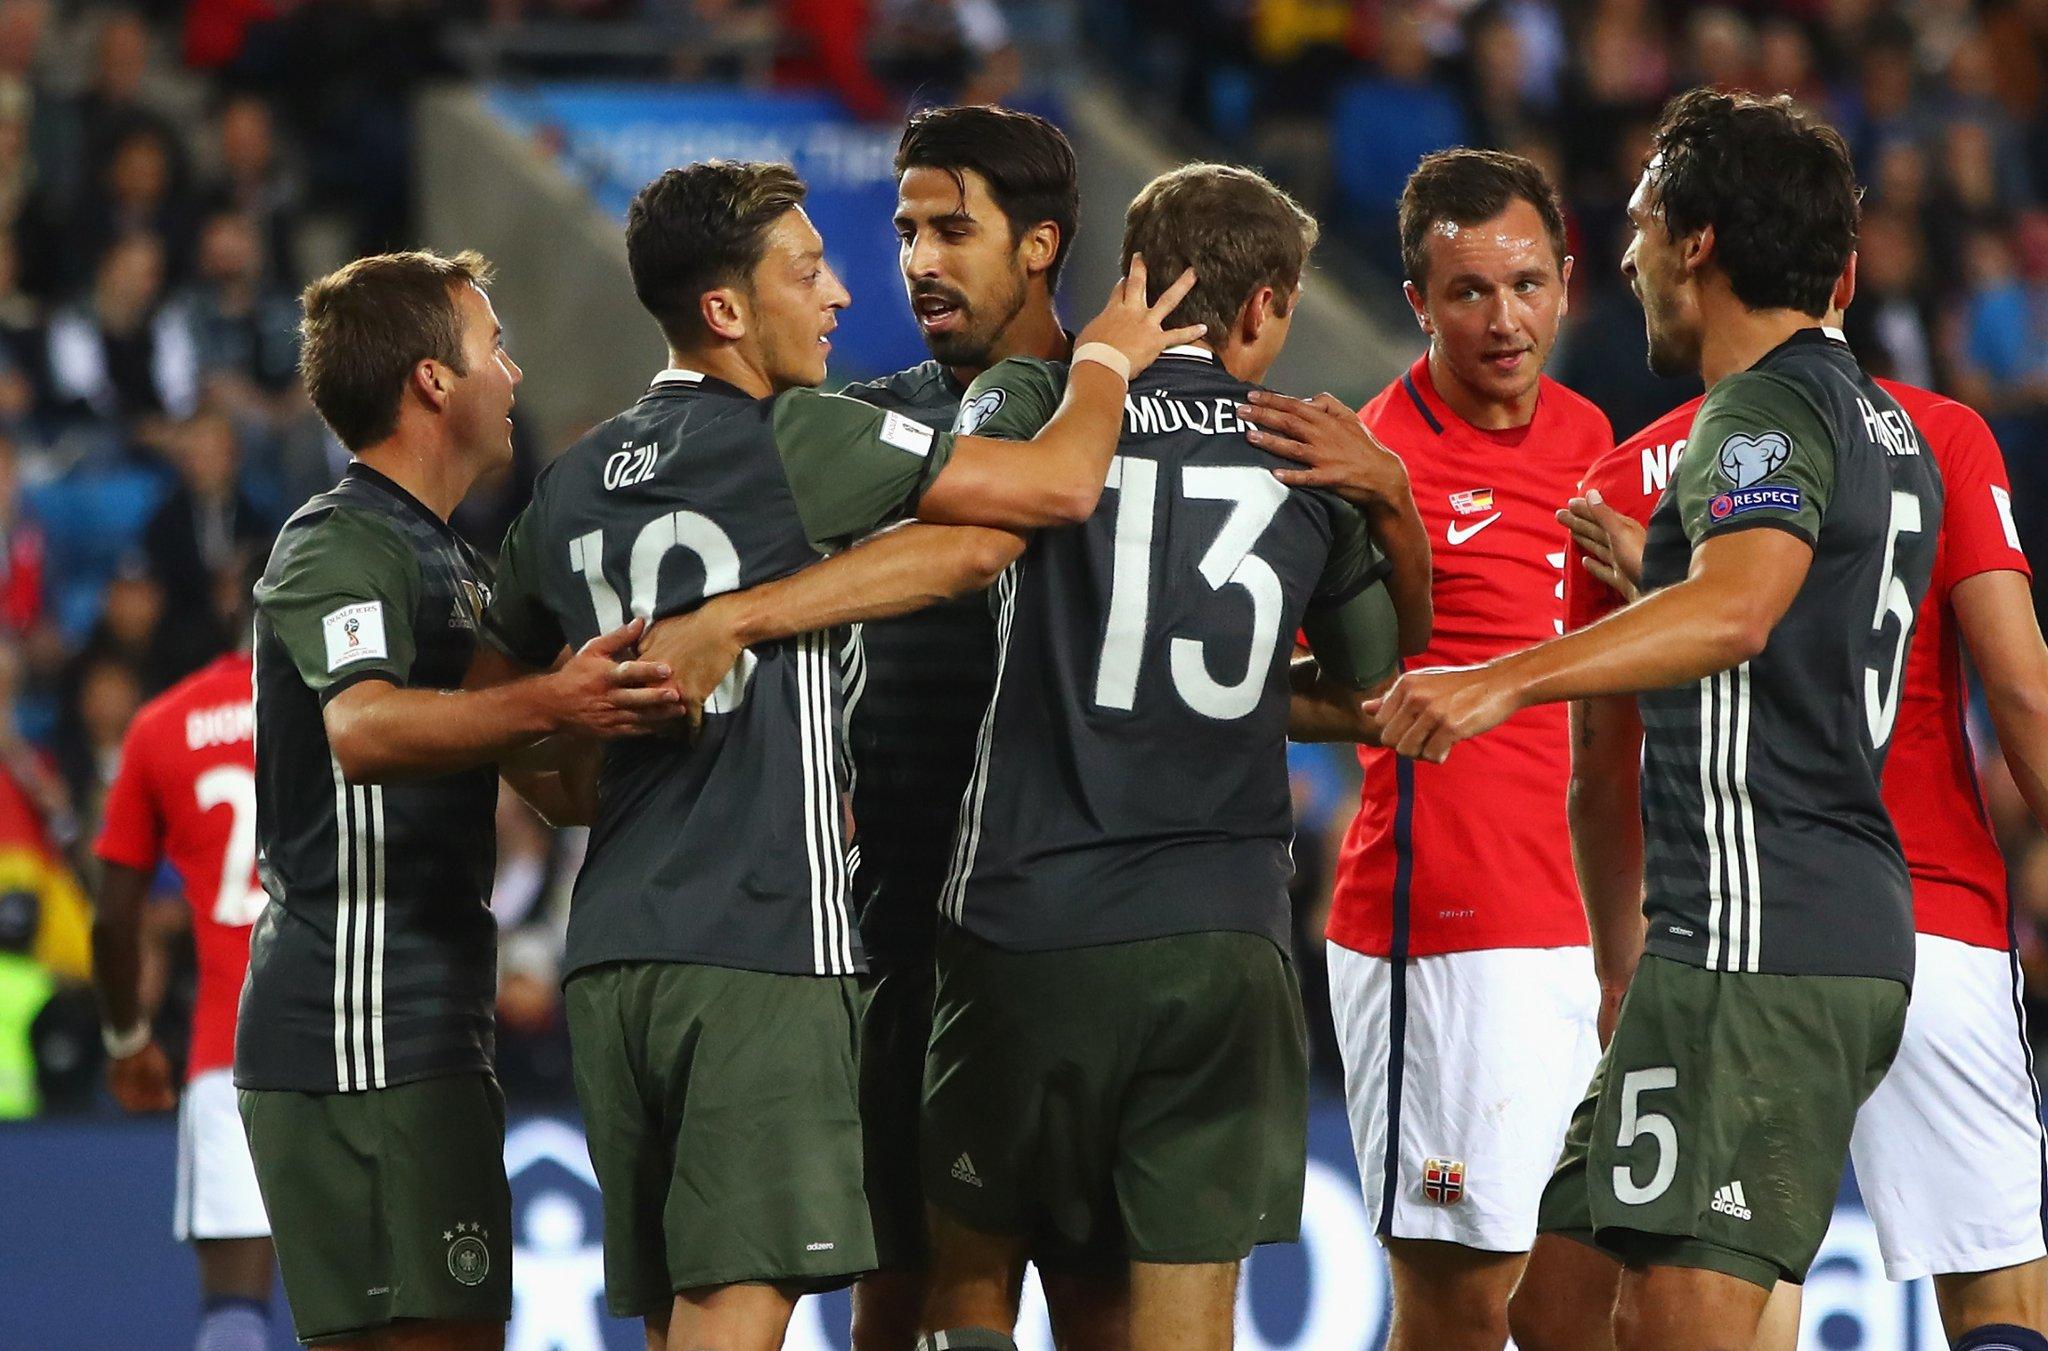 Russia 2018: Muller Bags Brace In Germany Win, Nigerian Scores For Malta